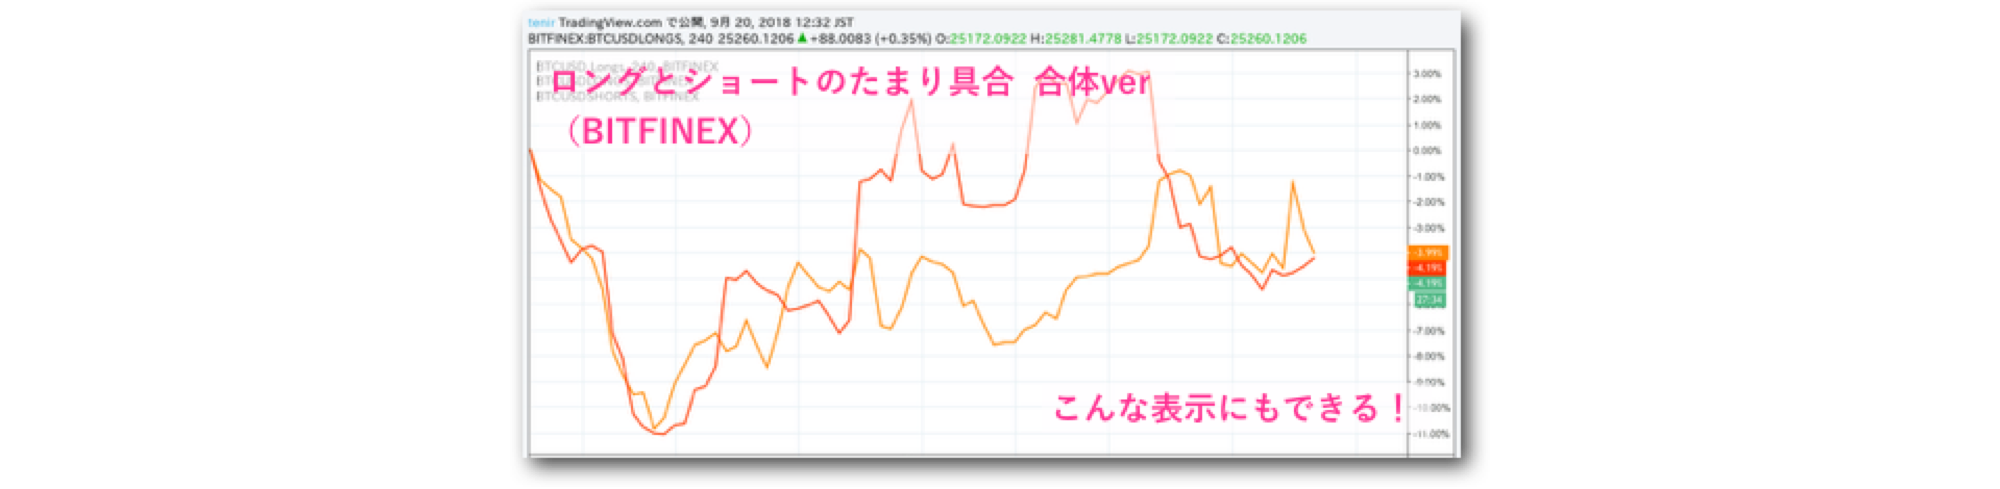 tradingview ロング ショート 比率 比較機能